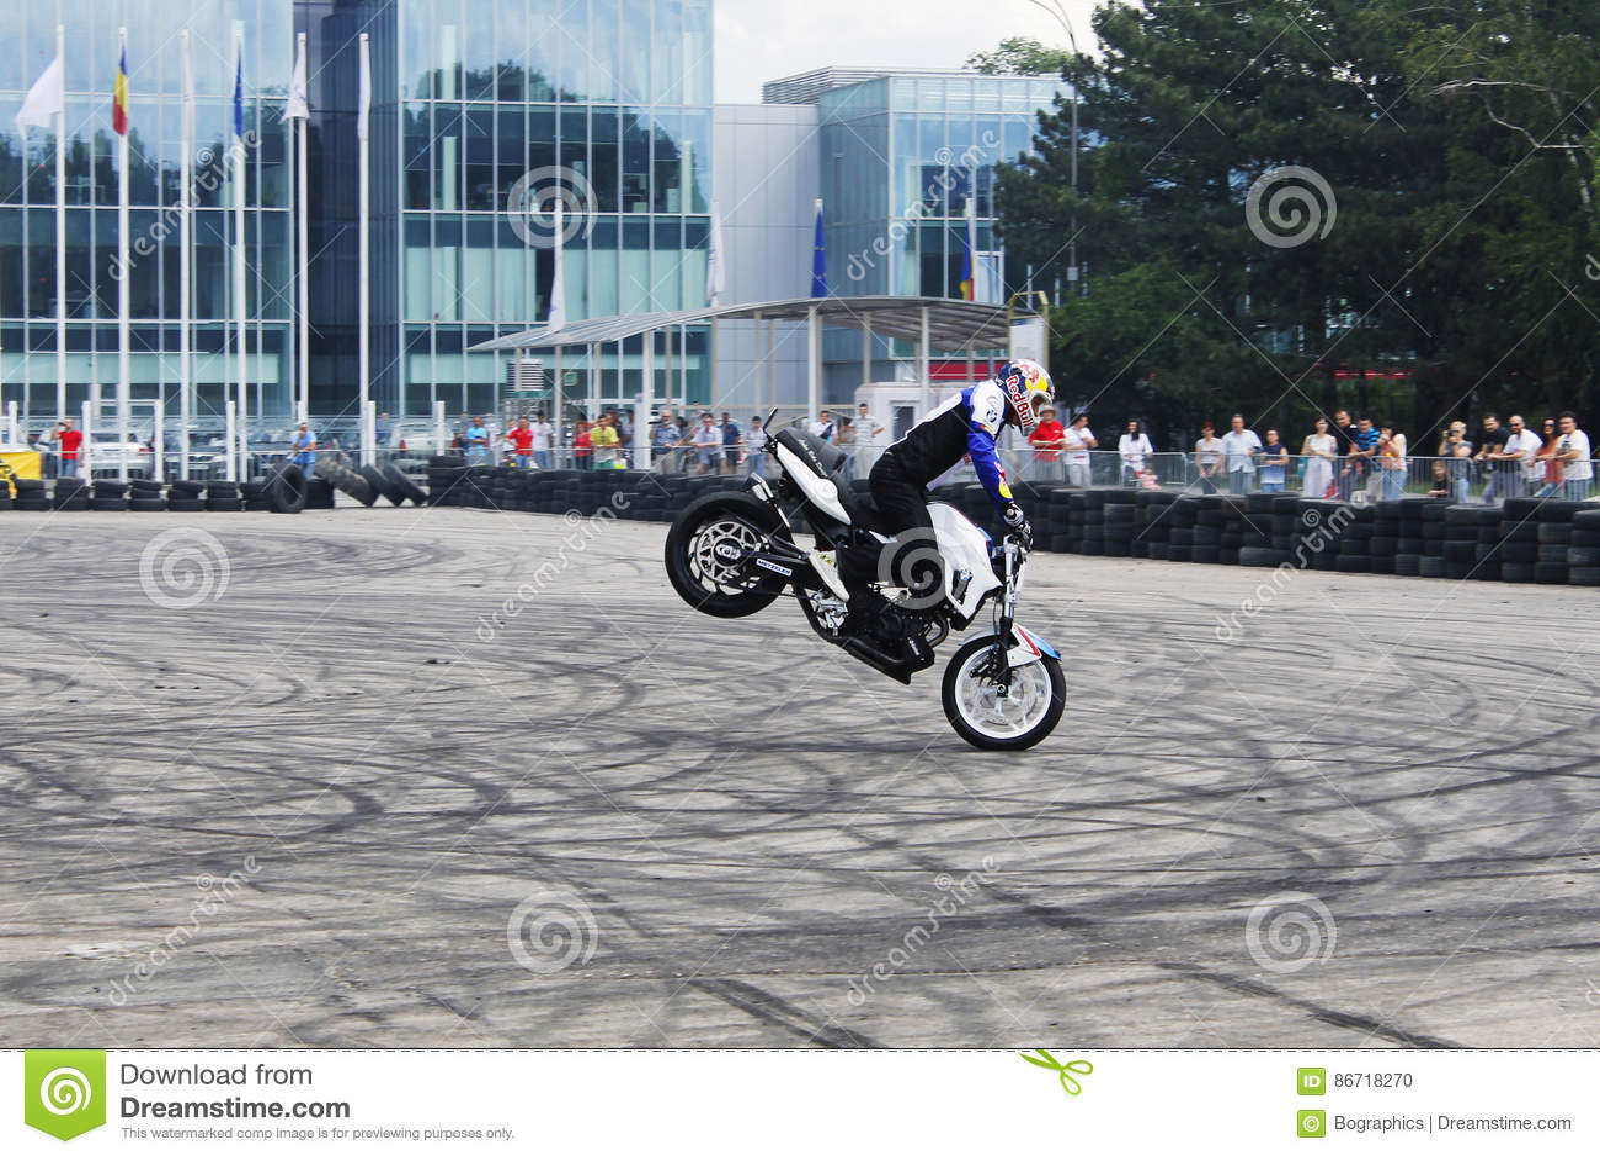 Bike stoppie motorcycle stunt rider acrobatics